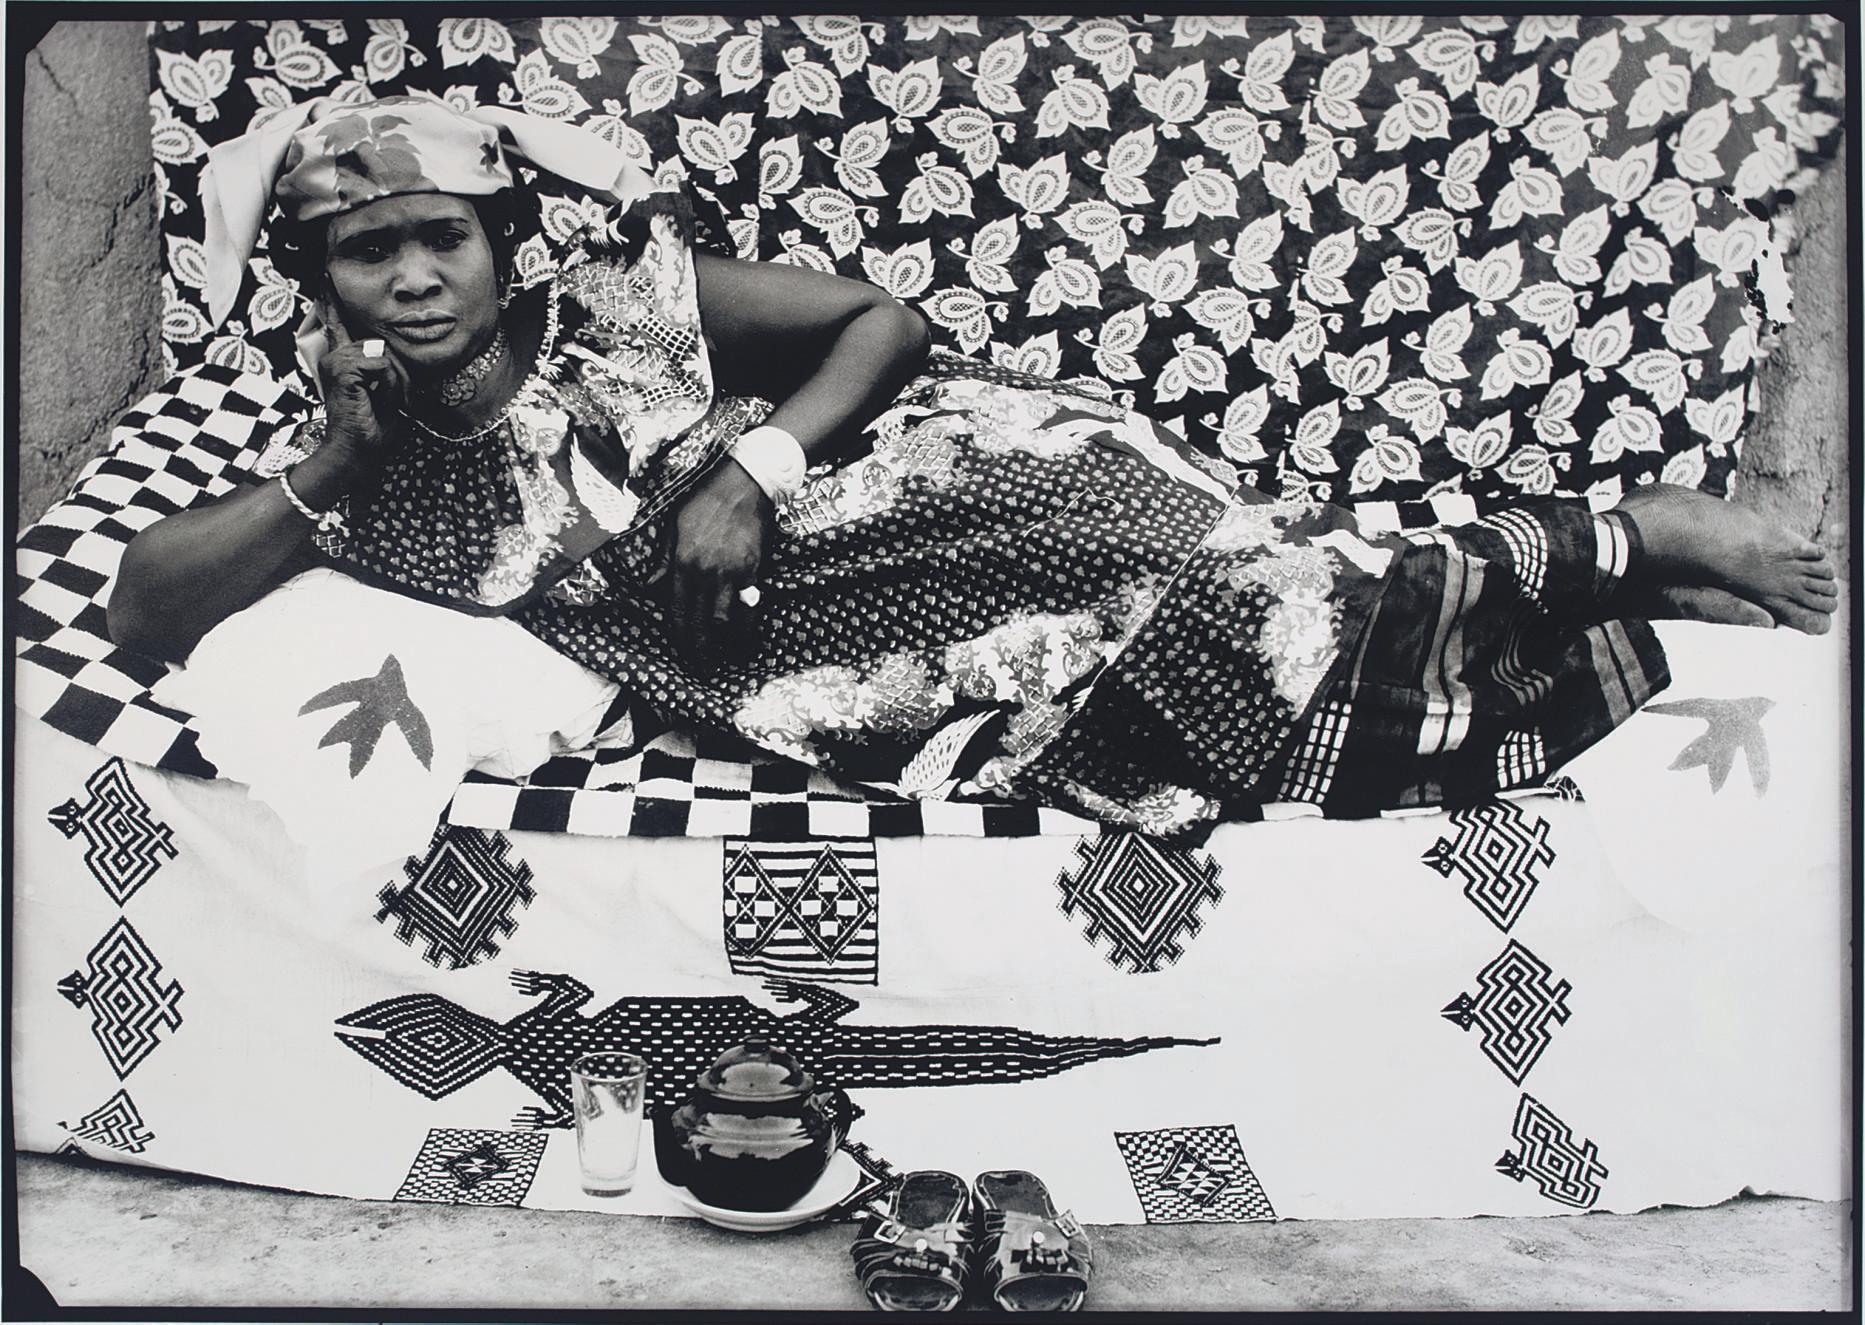 Reclining Woman, 1938